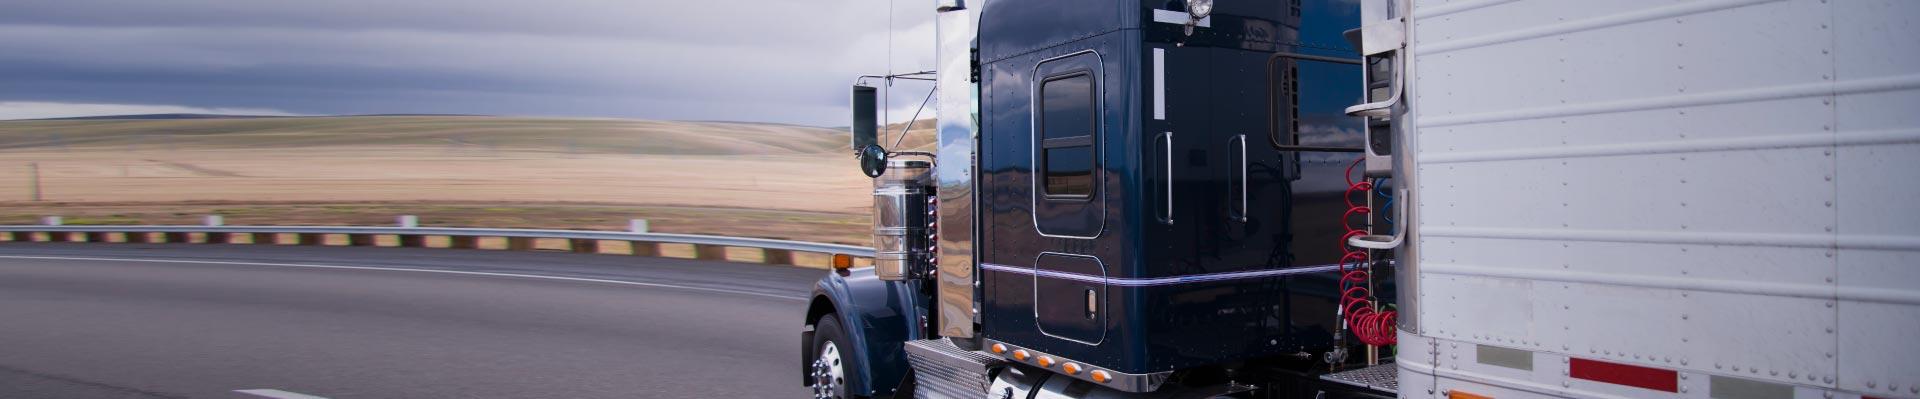 Online Auction - Transportation - Tractors, Beverage Trucks, & Vehicles